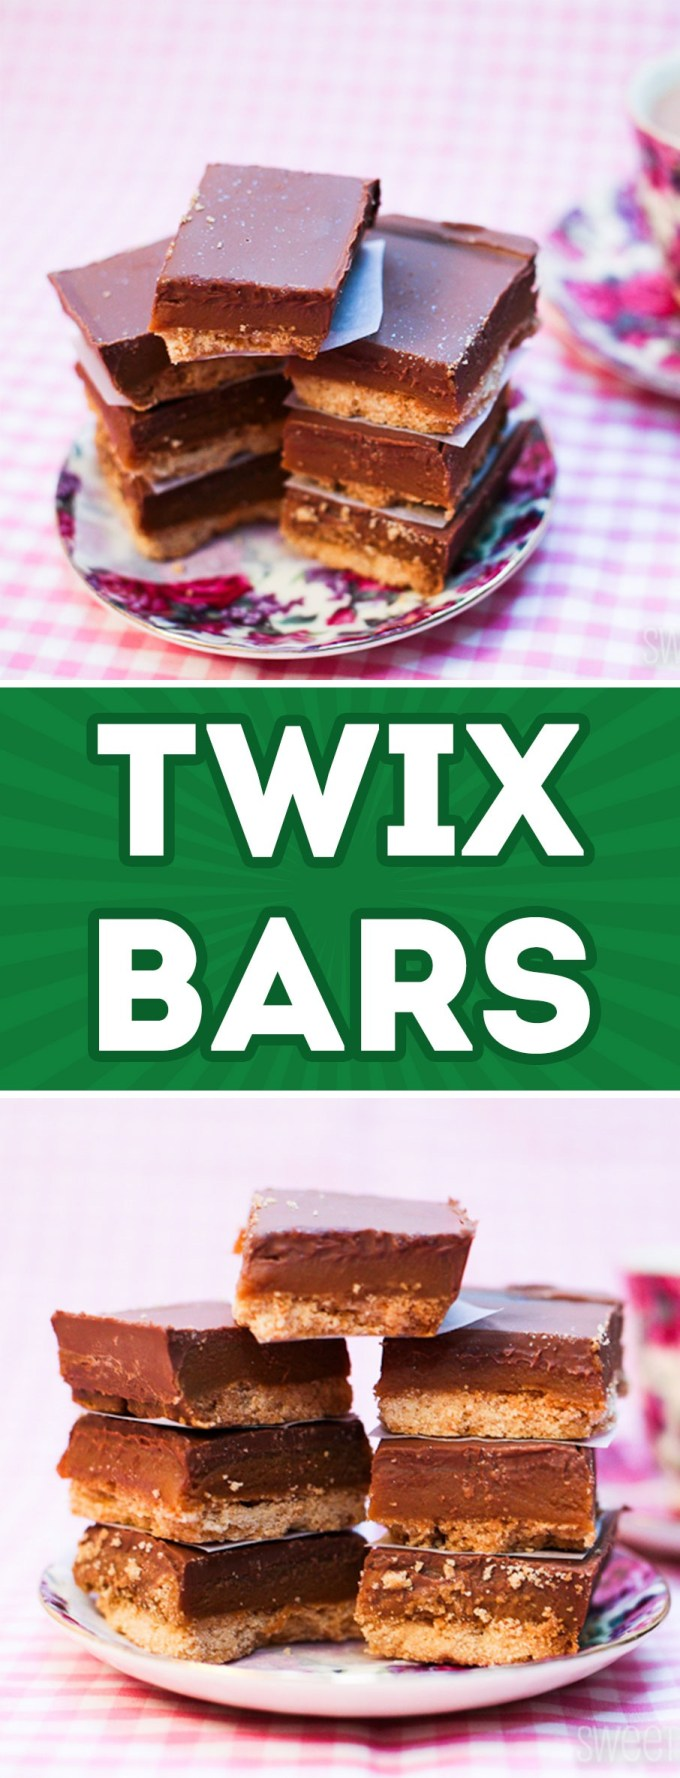 TWIX Bars Recipe by Sweet2EatBaking.com